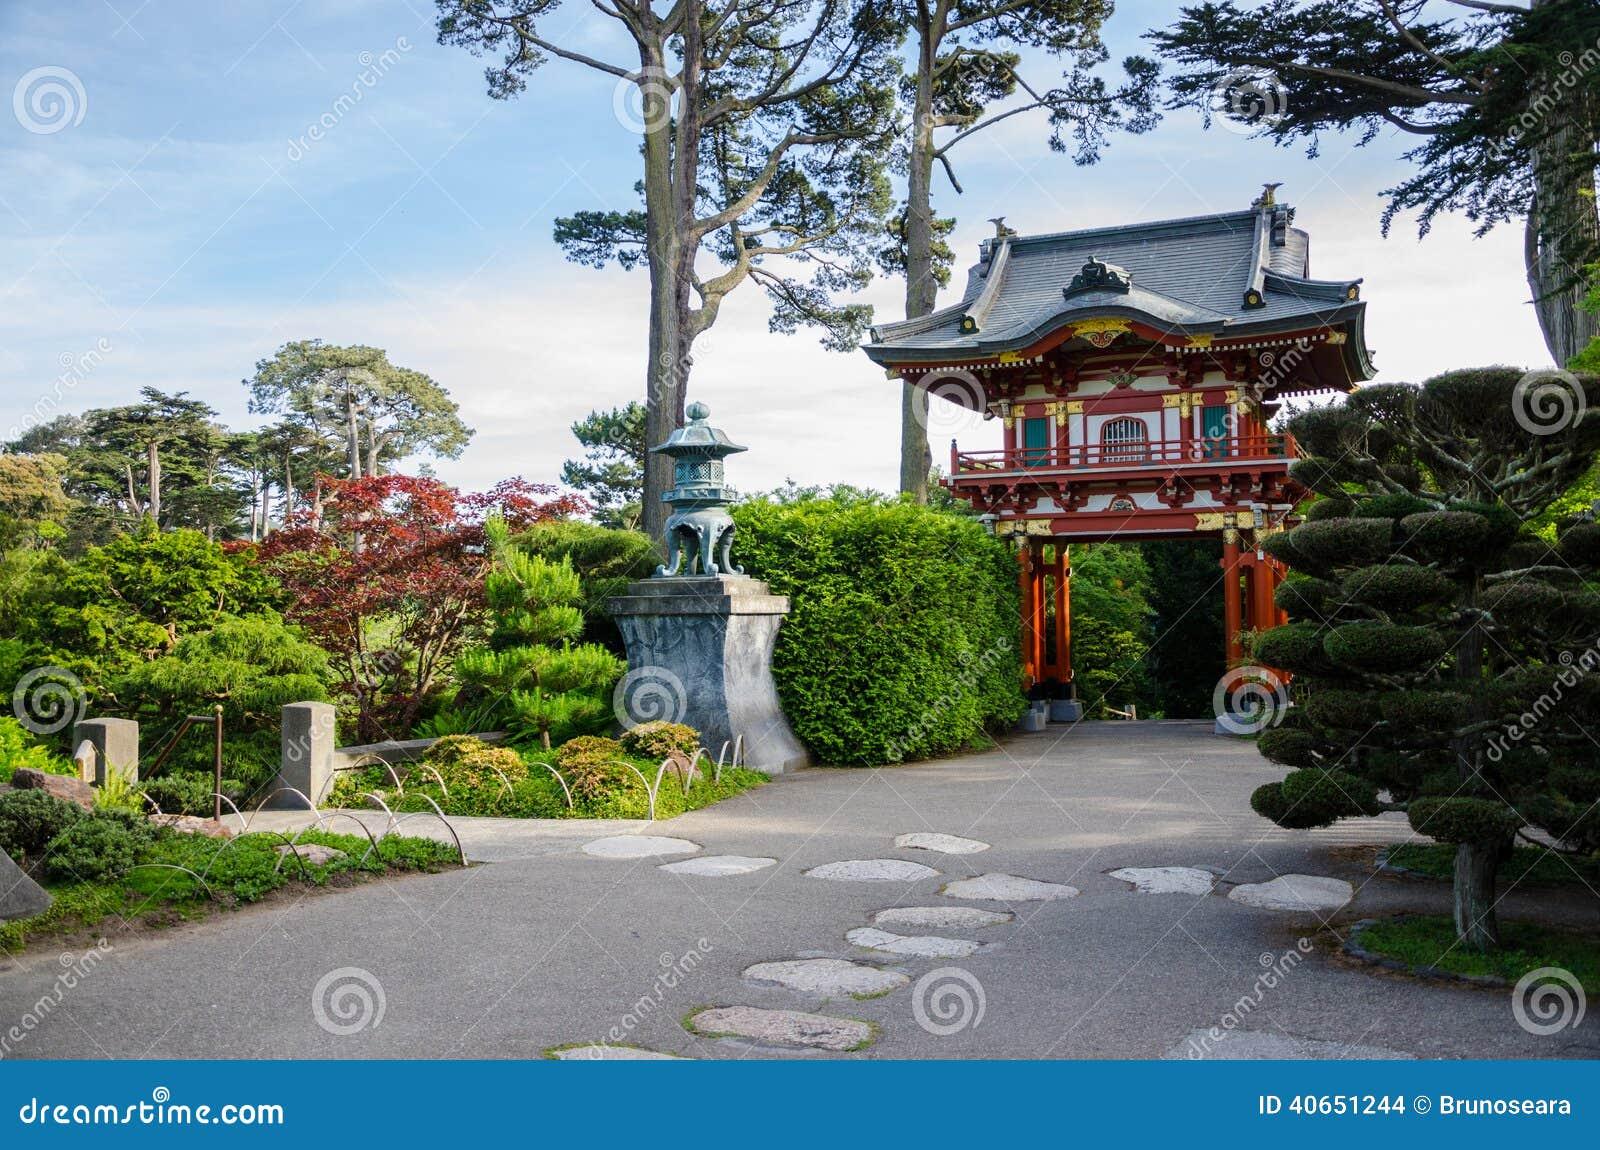 Japanese Tea Garden In San Francisco Stock Photo Image Of Gate Every 40651244